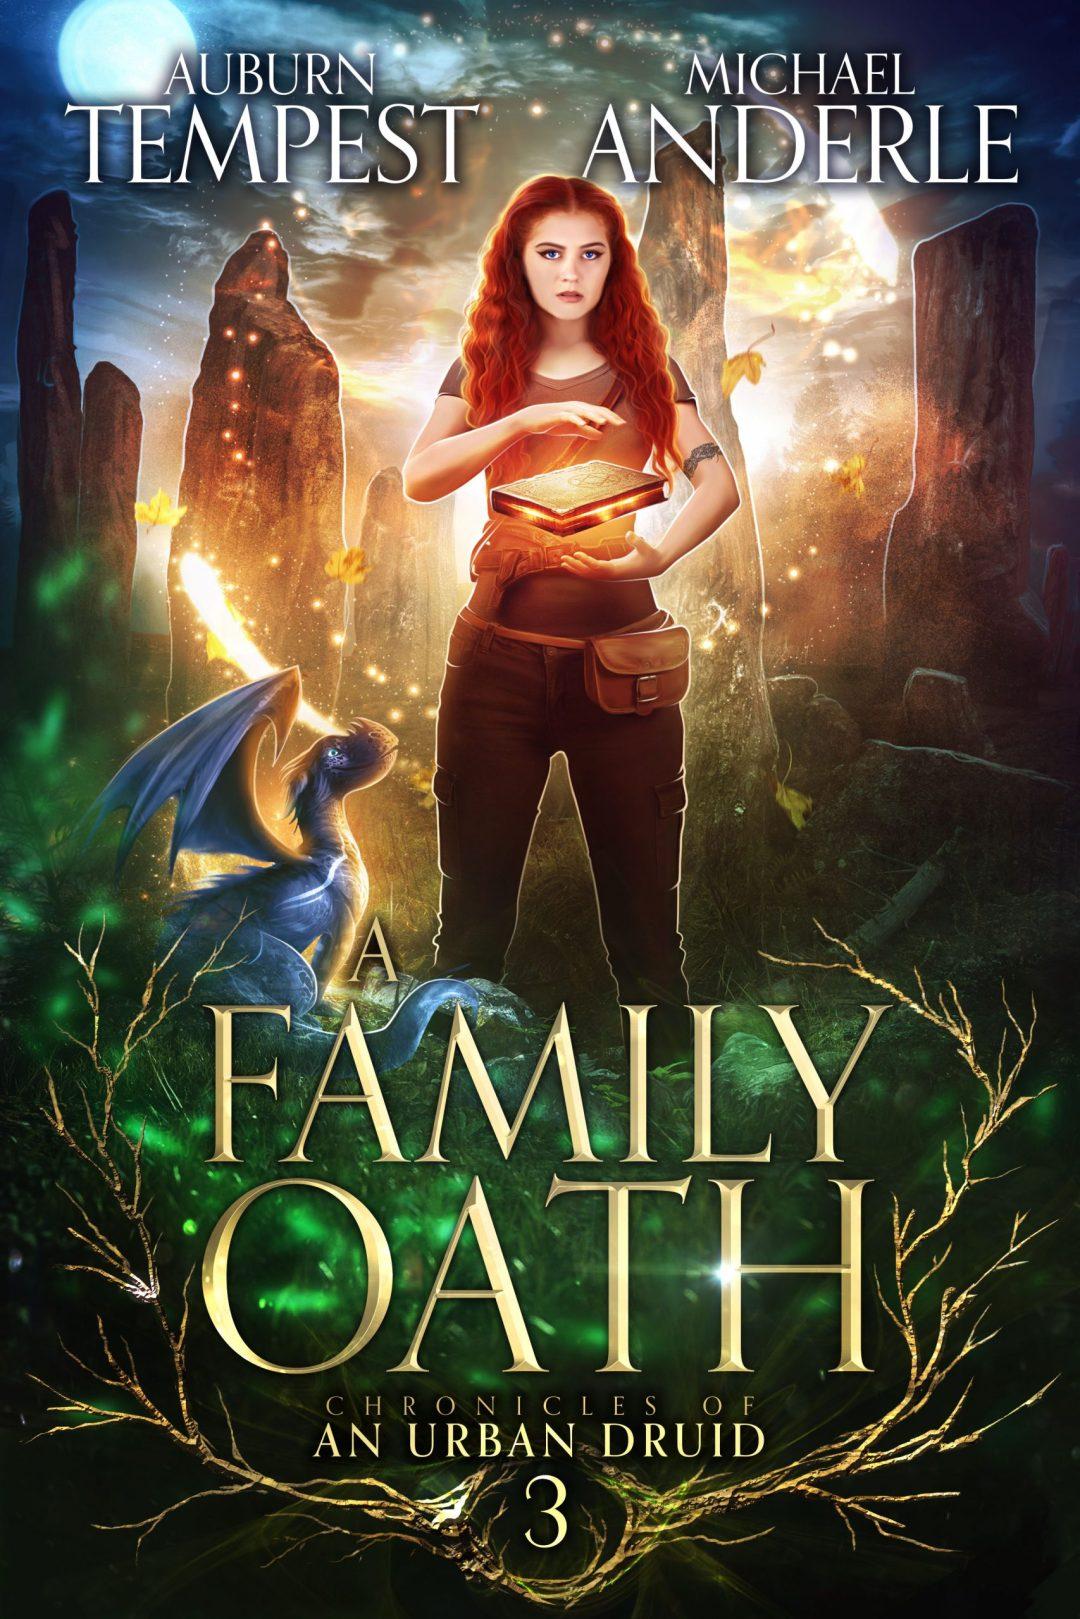 FAMILY OATH E-BOOK COVER